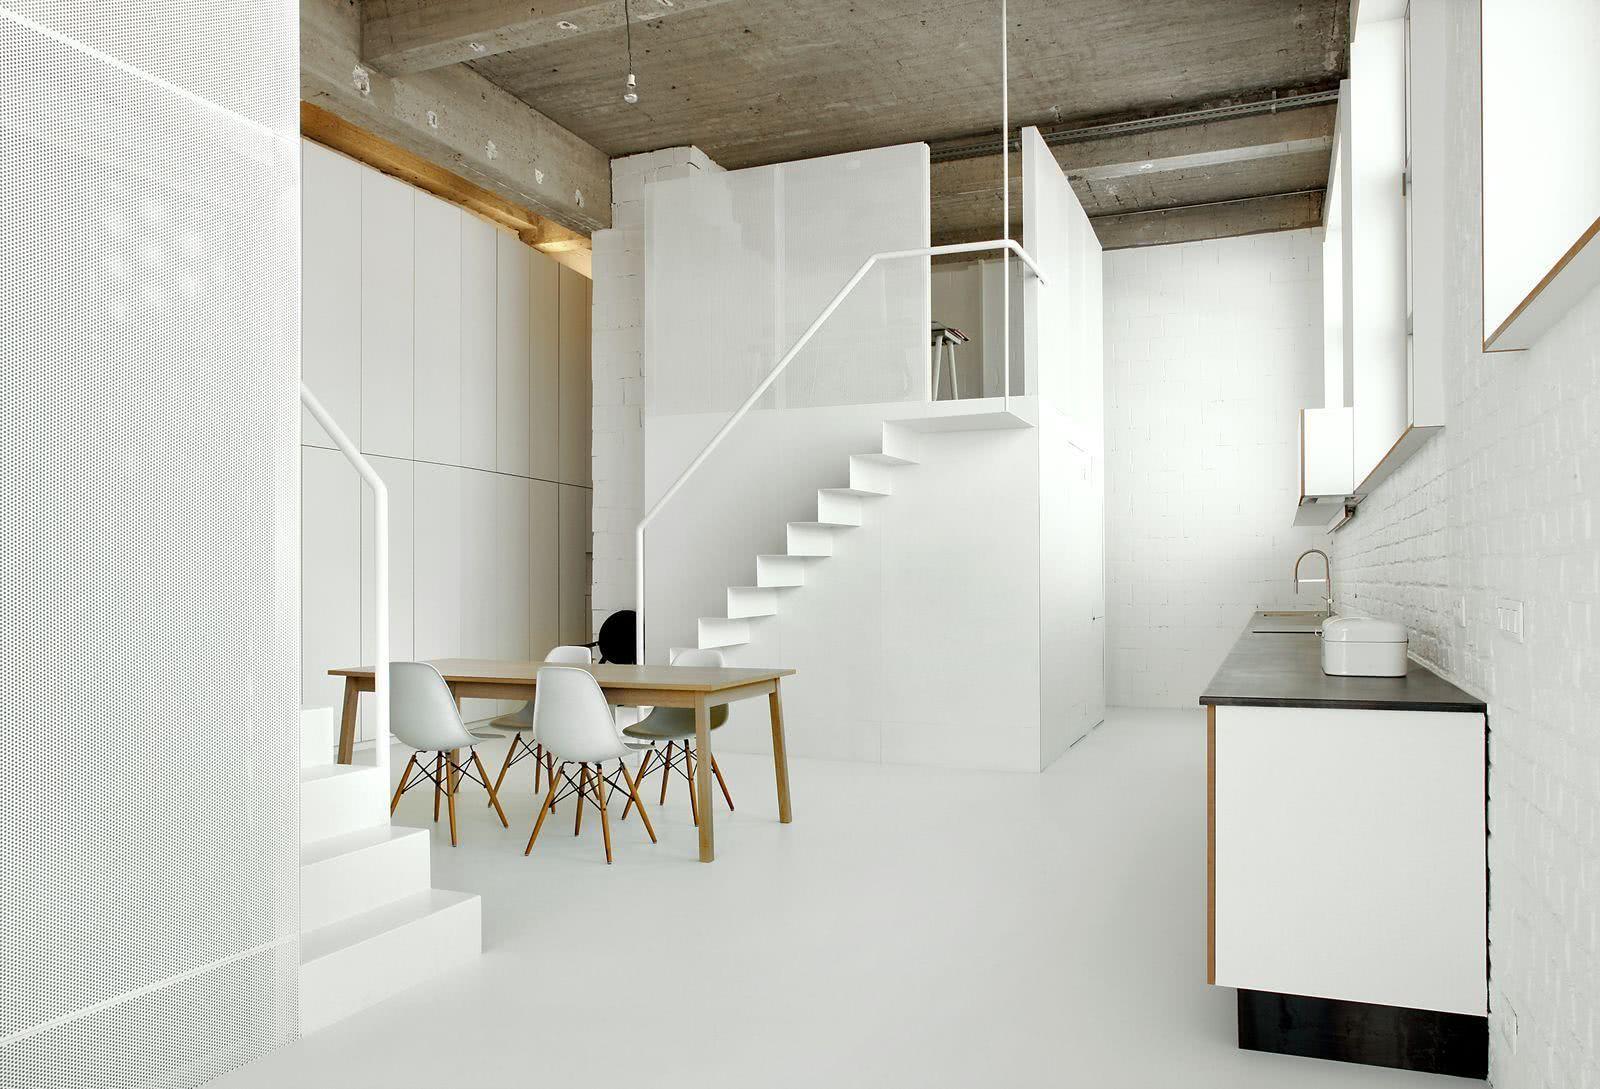 85 modelos de lofts decorados para te inspirar